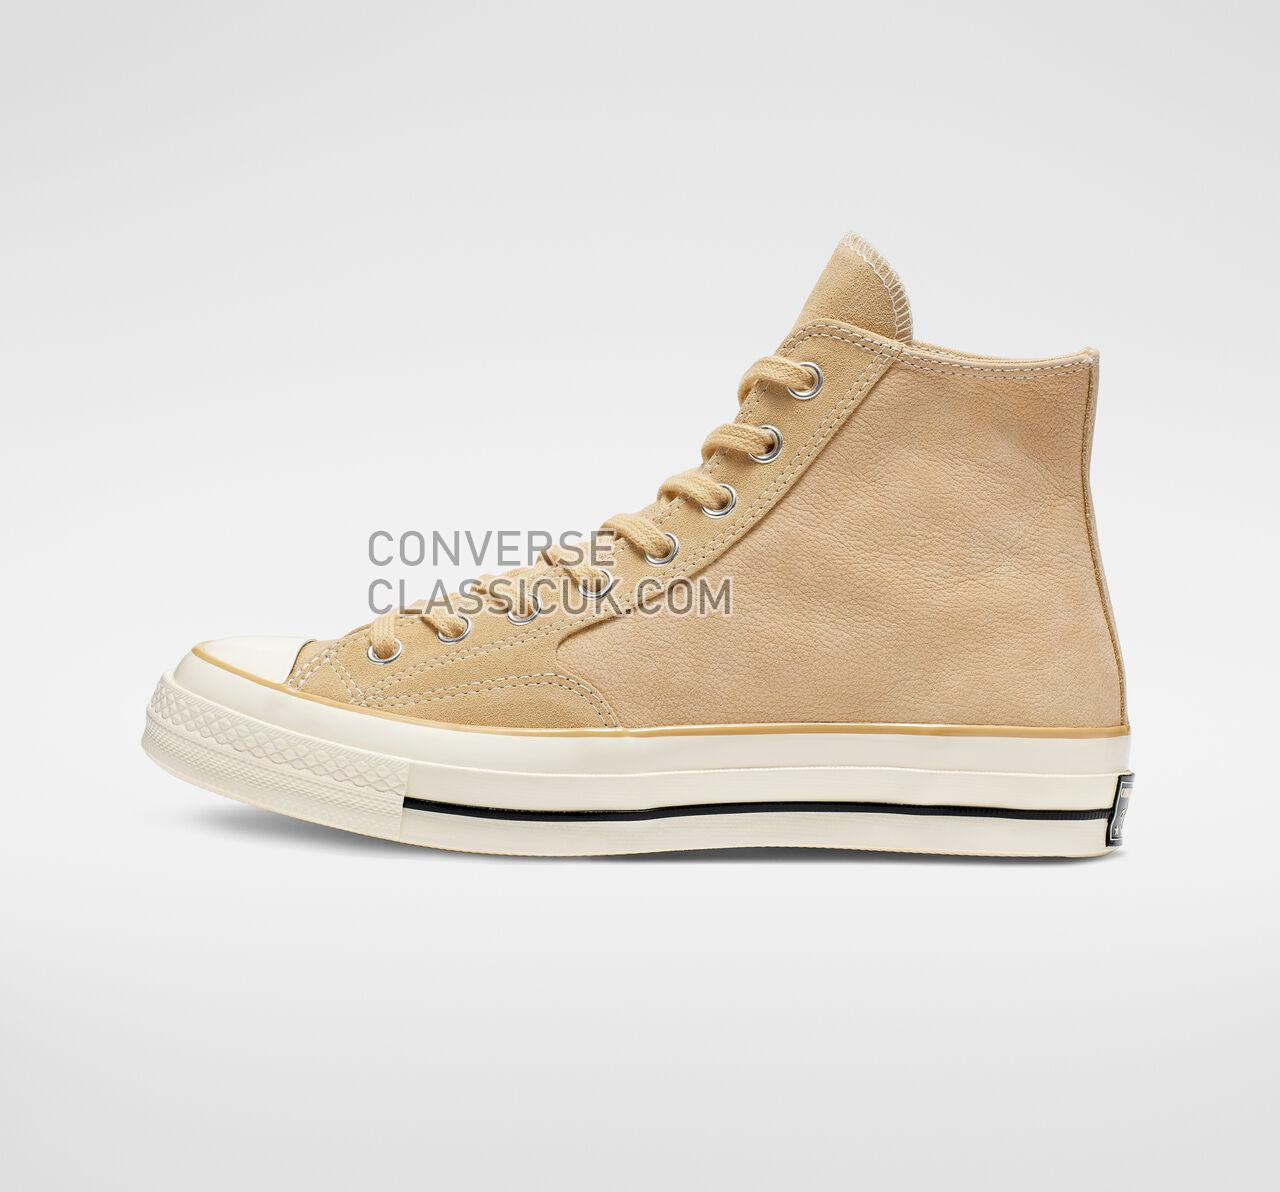 Converse Chuck 70 Leather High Top Mens Womens Unisex 164930C Pale Wheat/Egret/Black Shoes